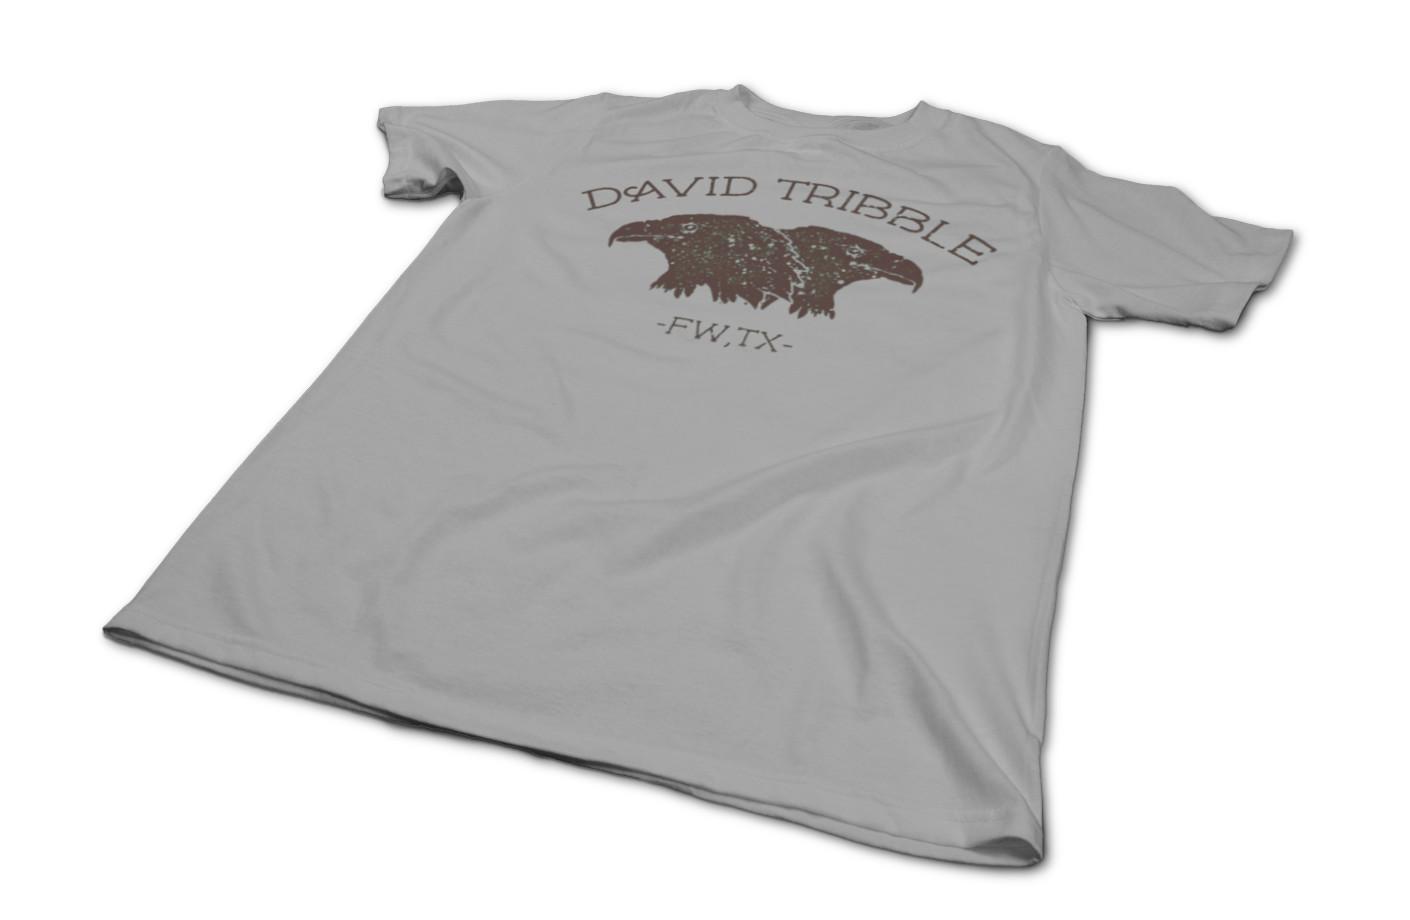 David tribble crow logo fw best 1530373424